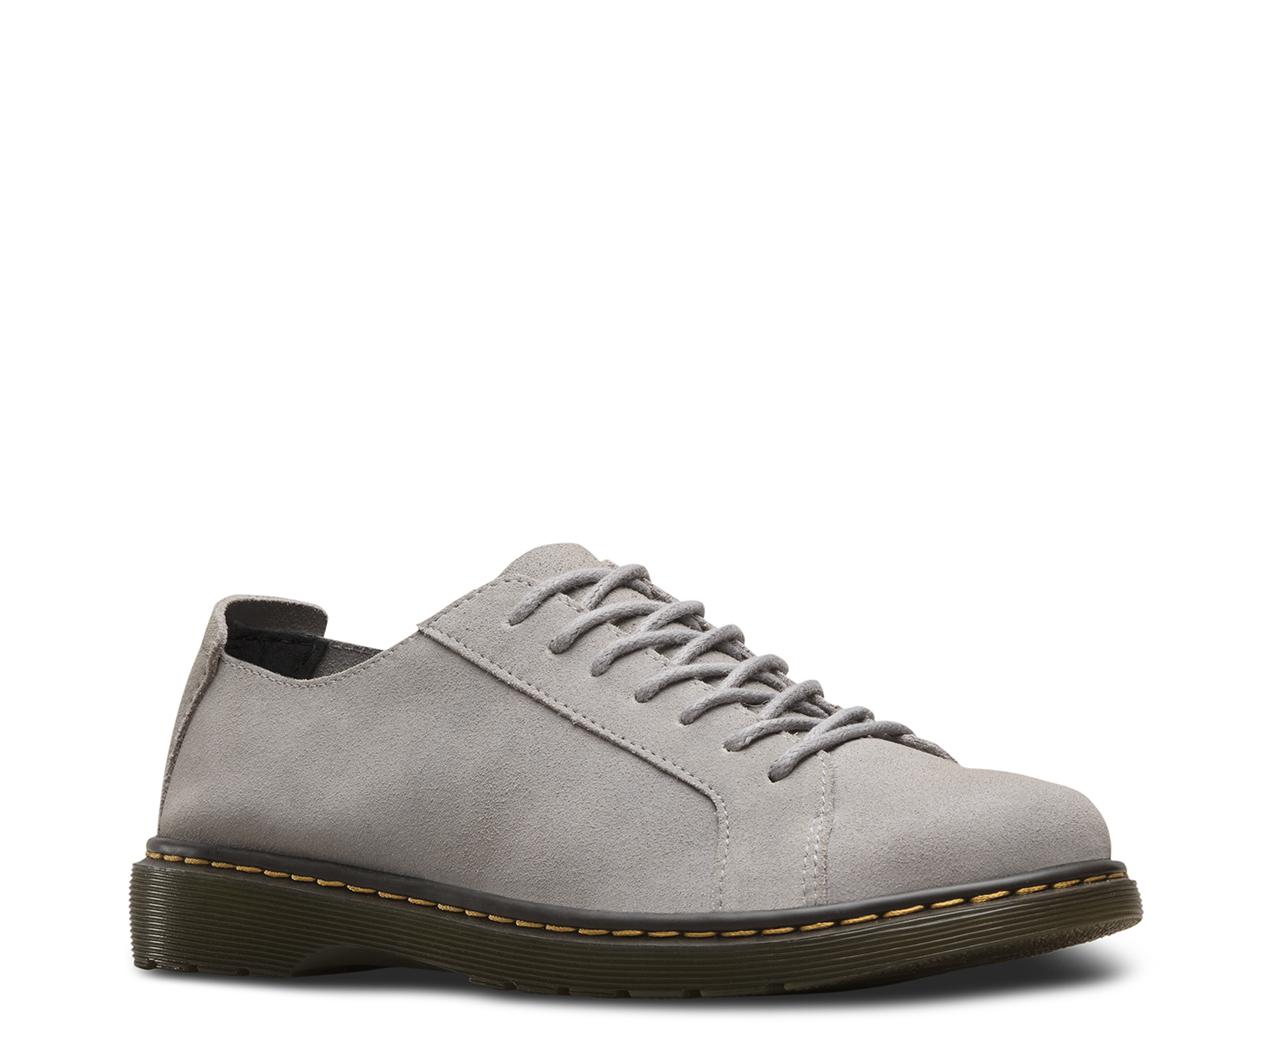 Dr. Martens Men's Islip Bronx Suede Lace Shoes - Mid - UK 6 TmwVc